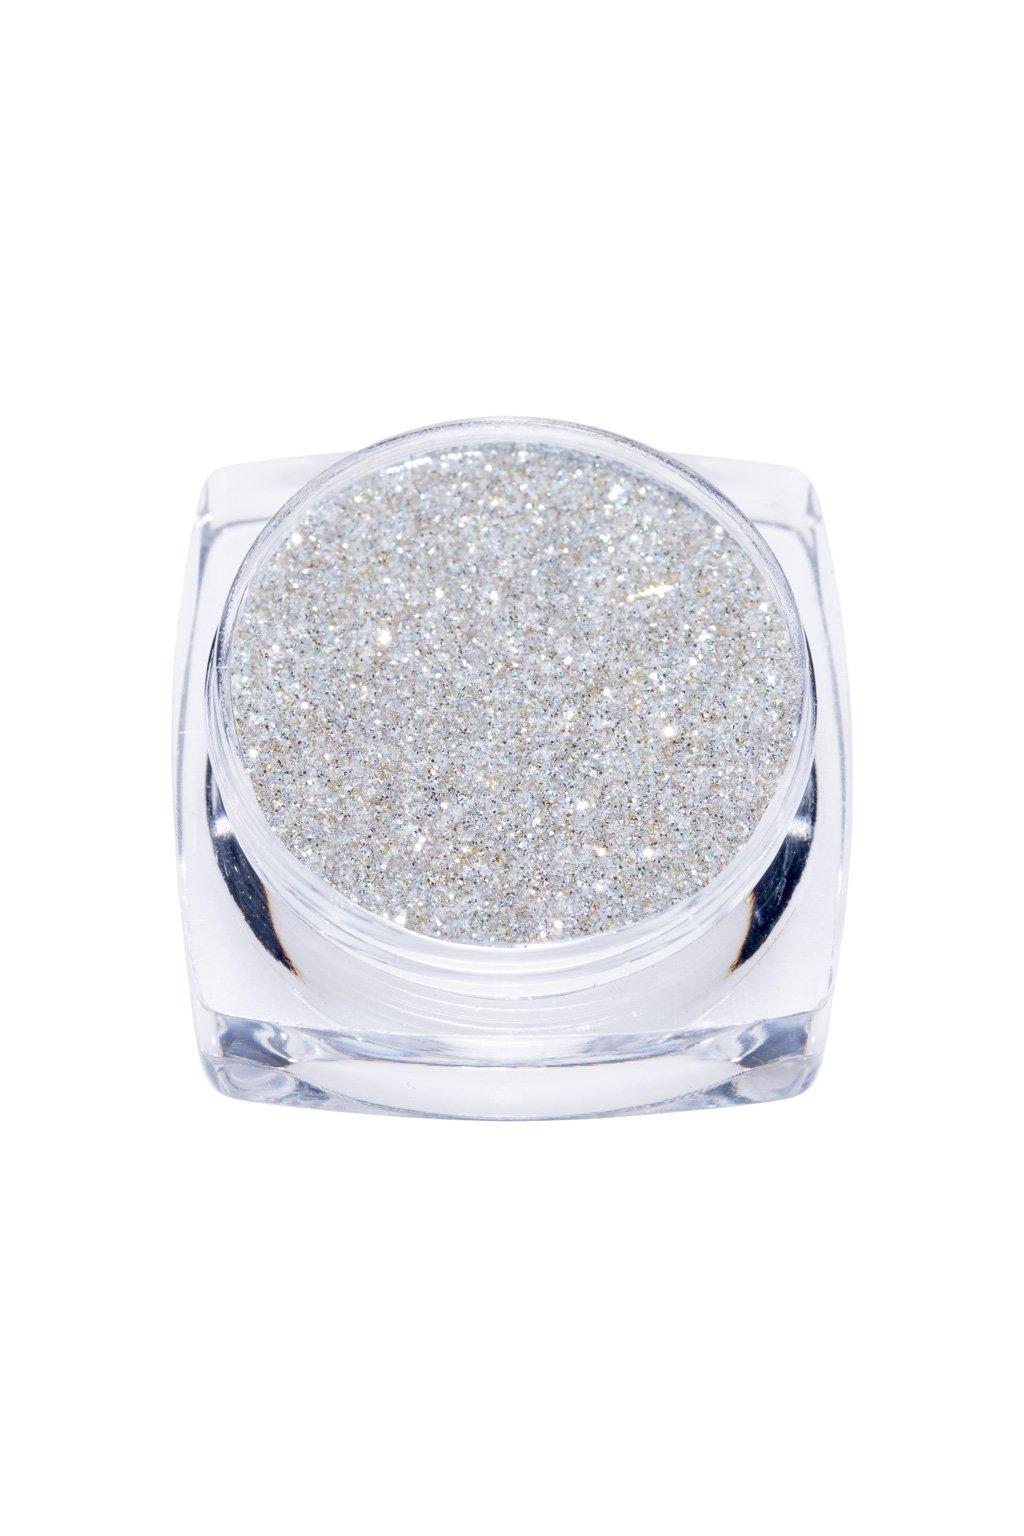 23579 sparkling mix sand